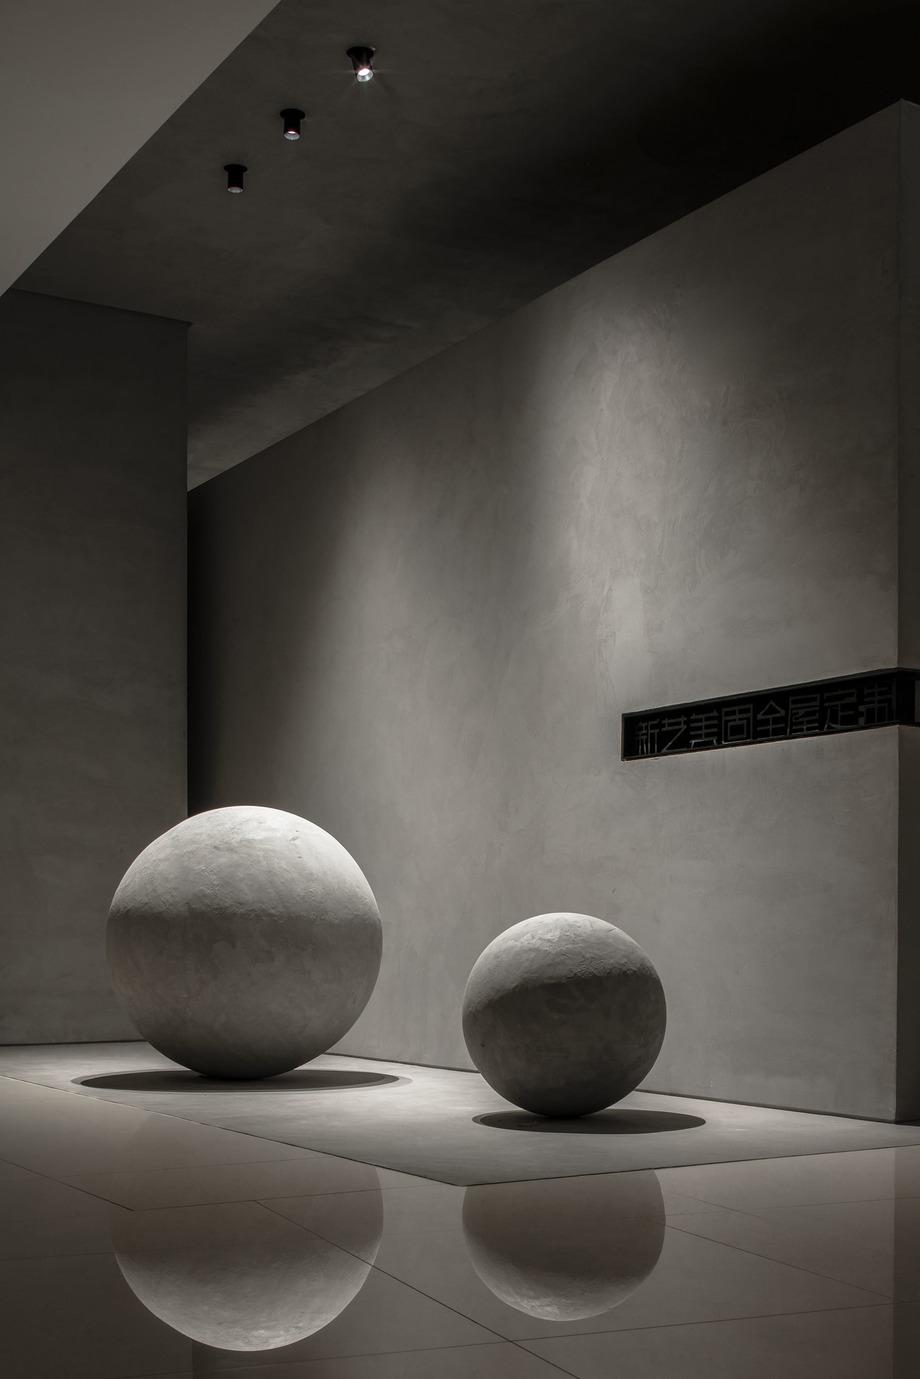 showroom de jst architecture (21) - foto he chuanjpg